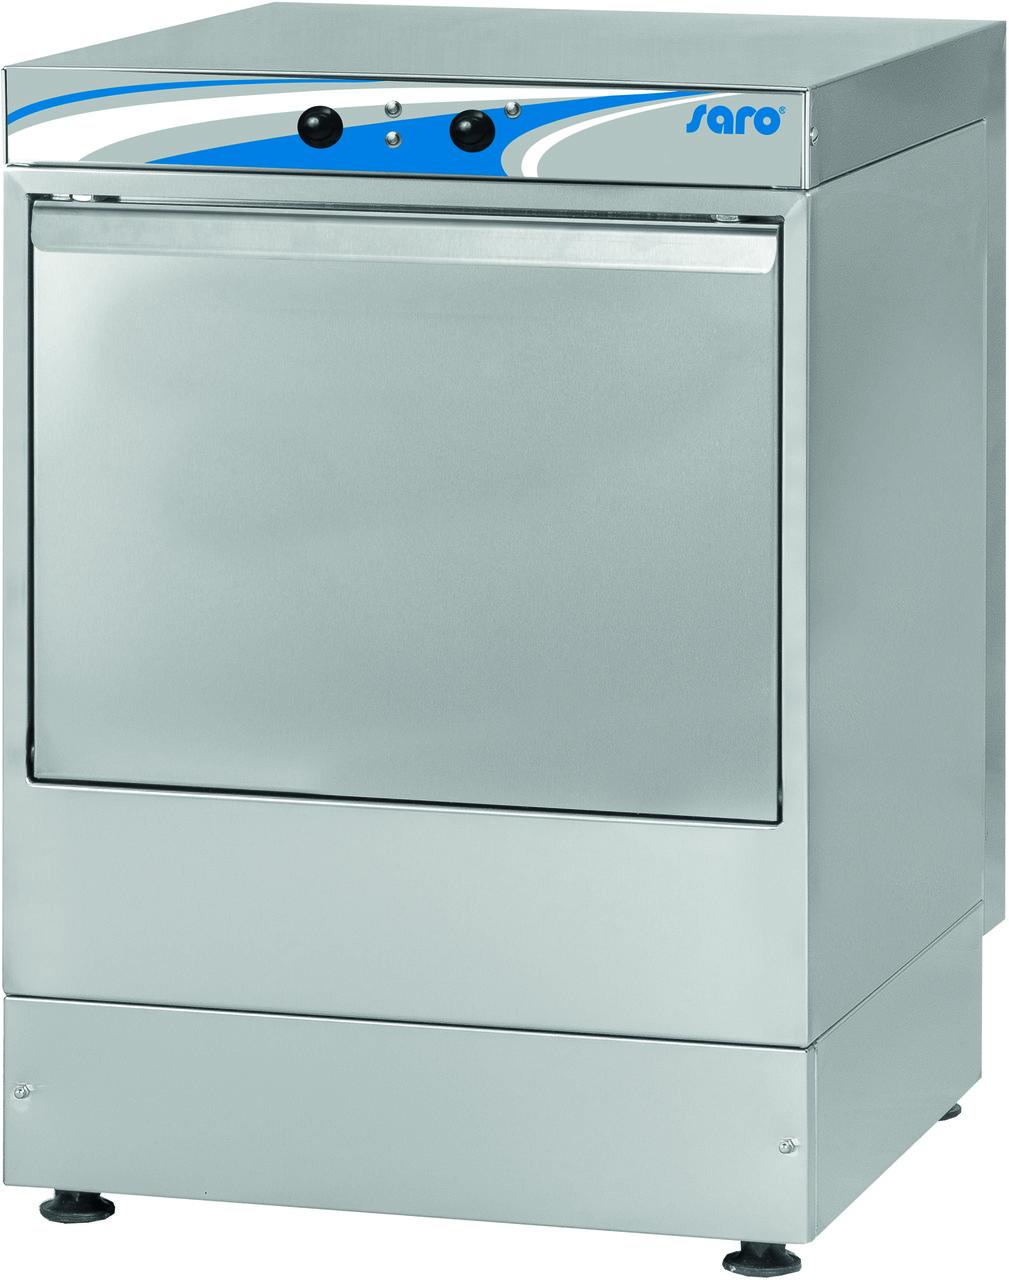 Посудомоечная машина MÜNCHEN Saro